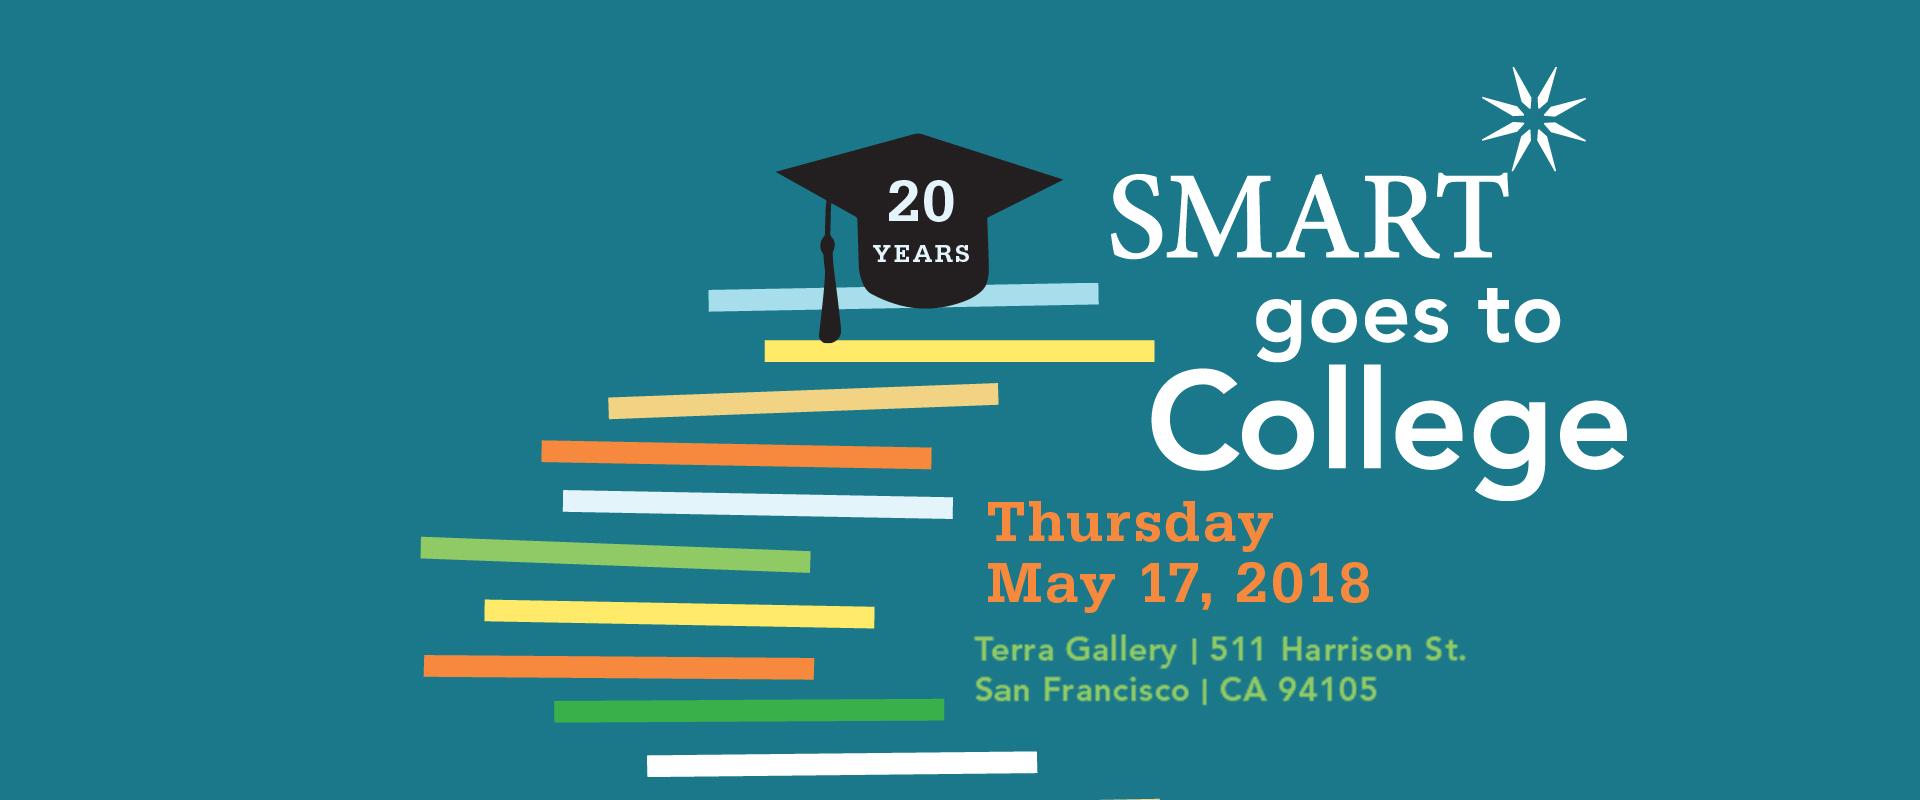 Celebrate 20 years of SMART